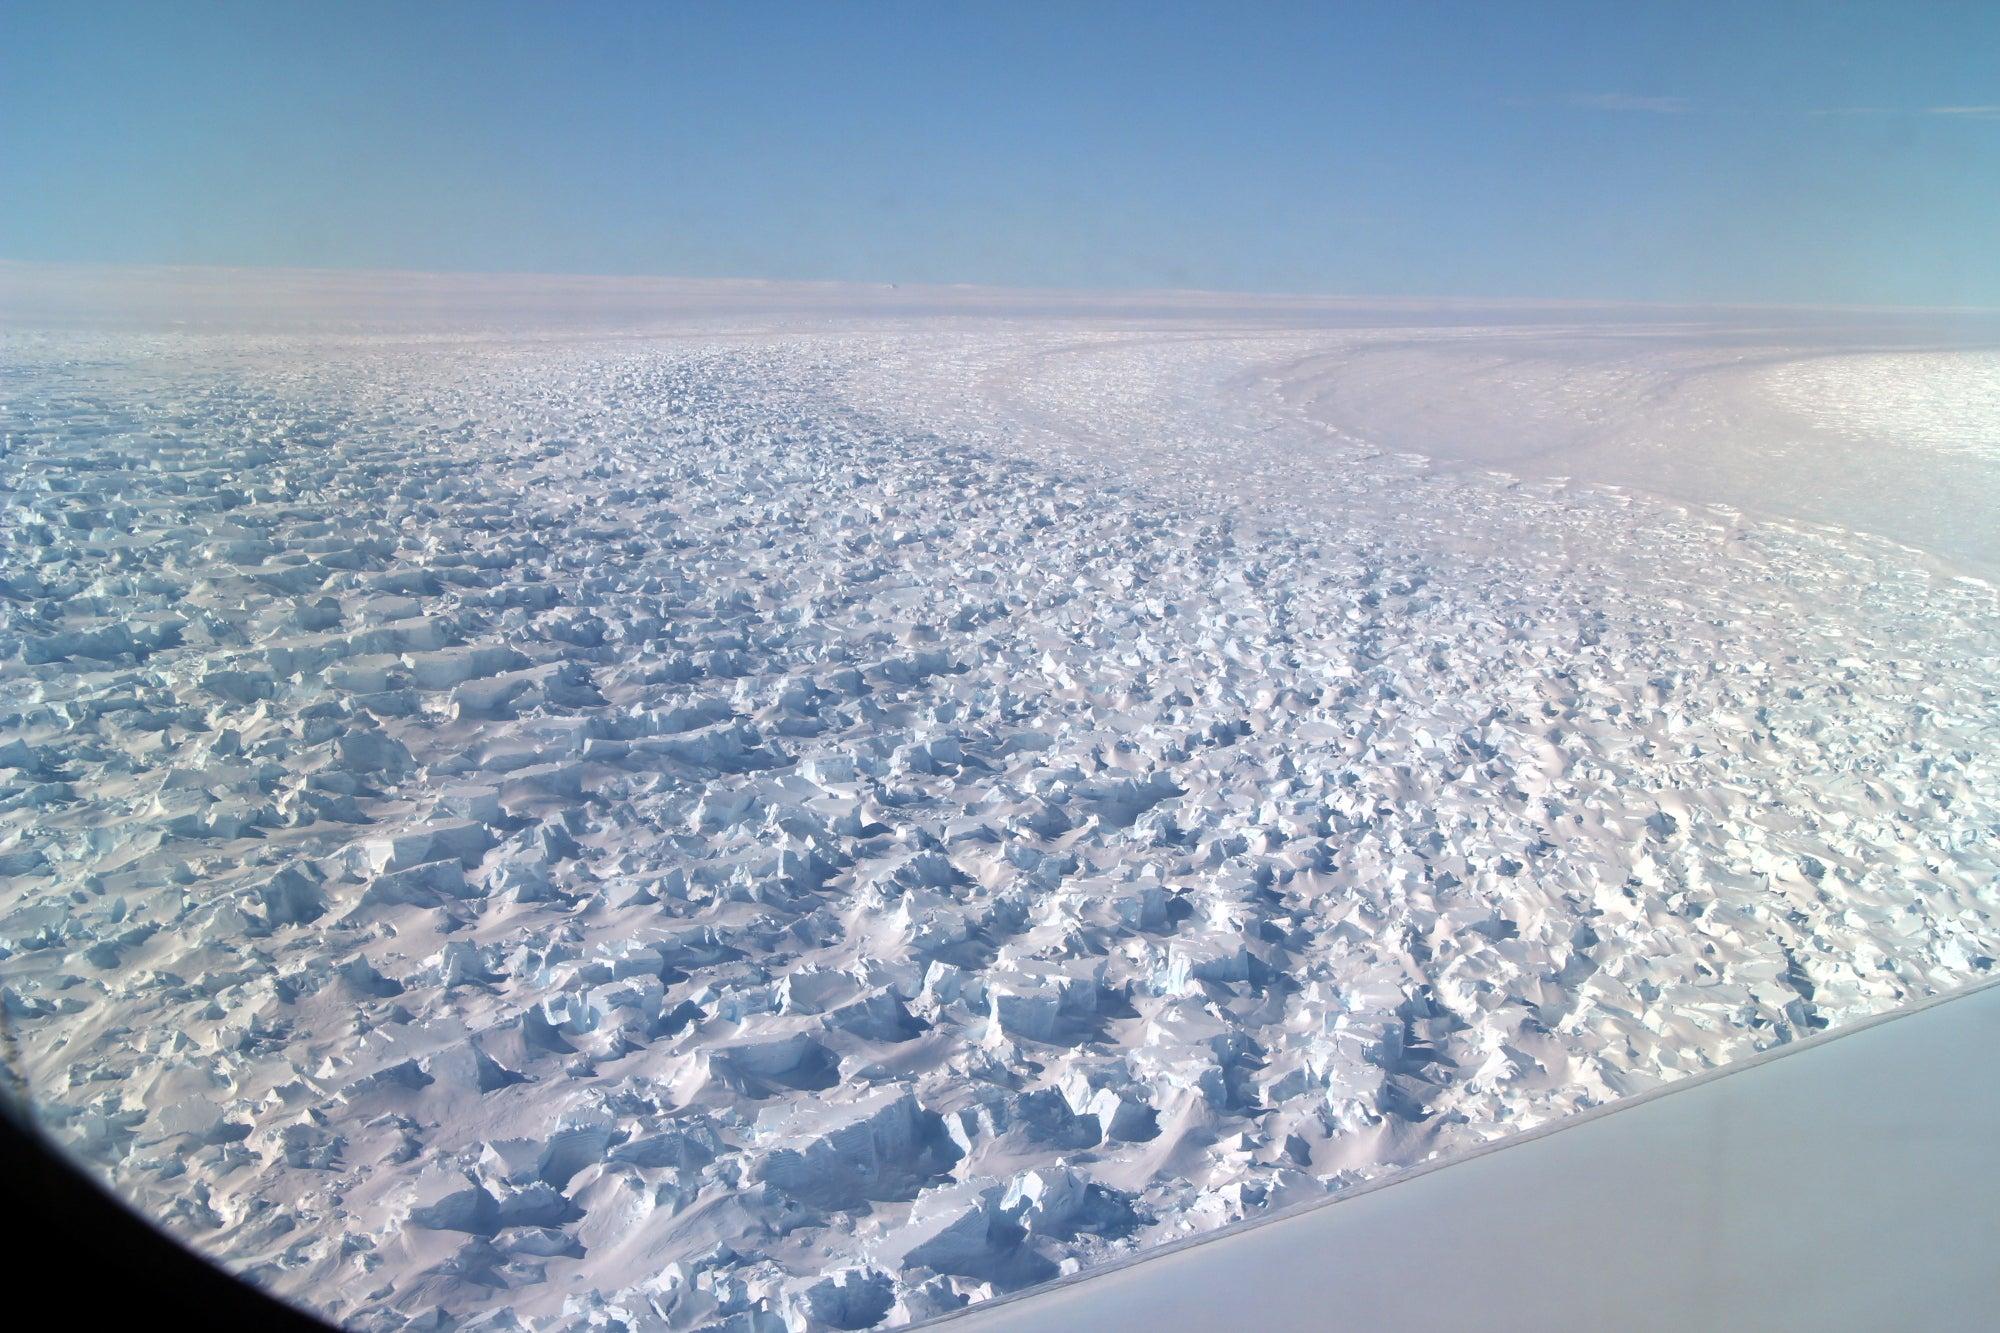 Antarctic Glacier Has Retreated 3 Miles in 22 Years